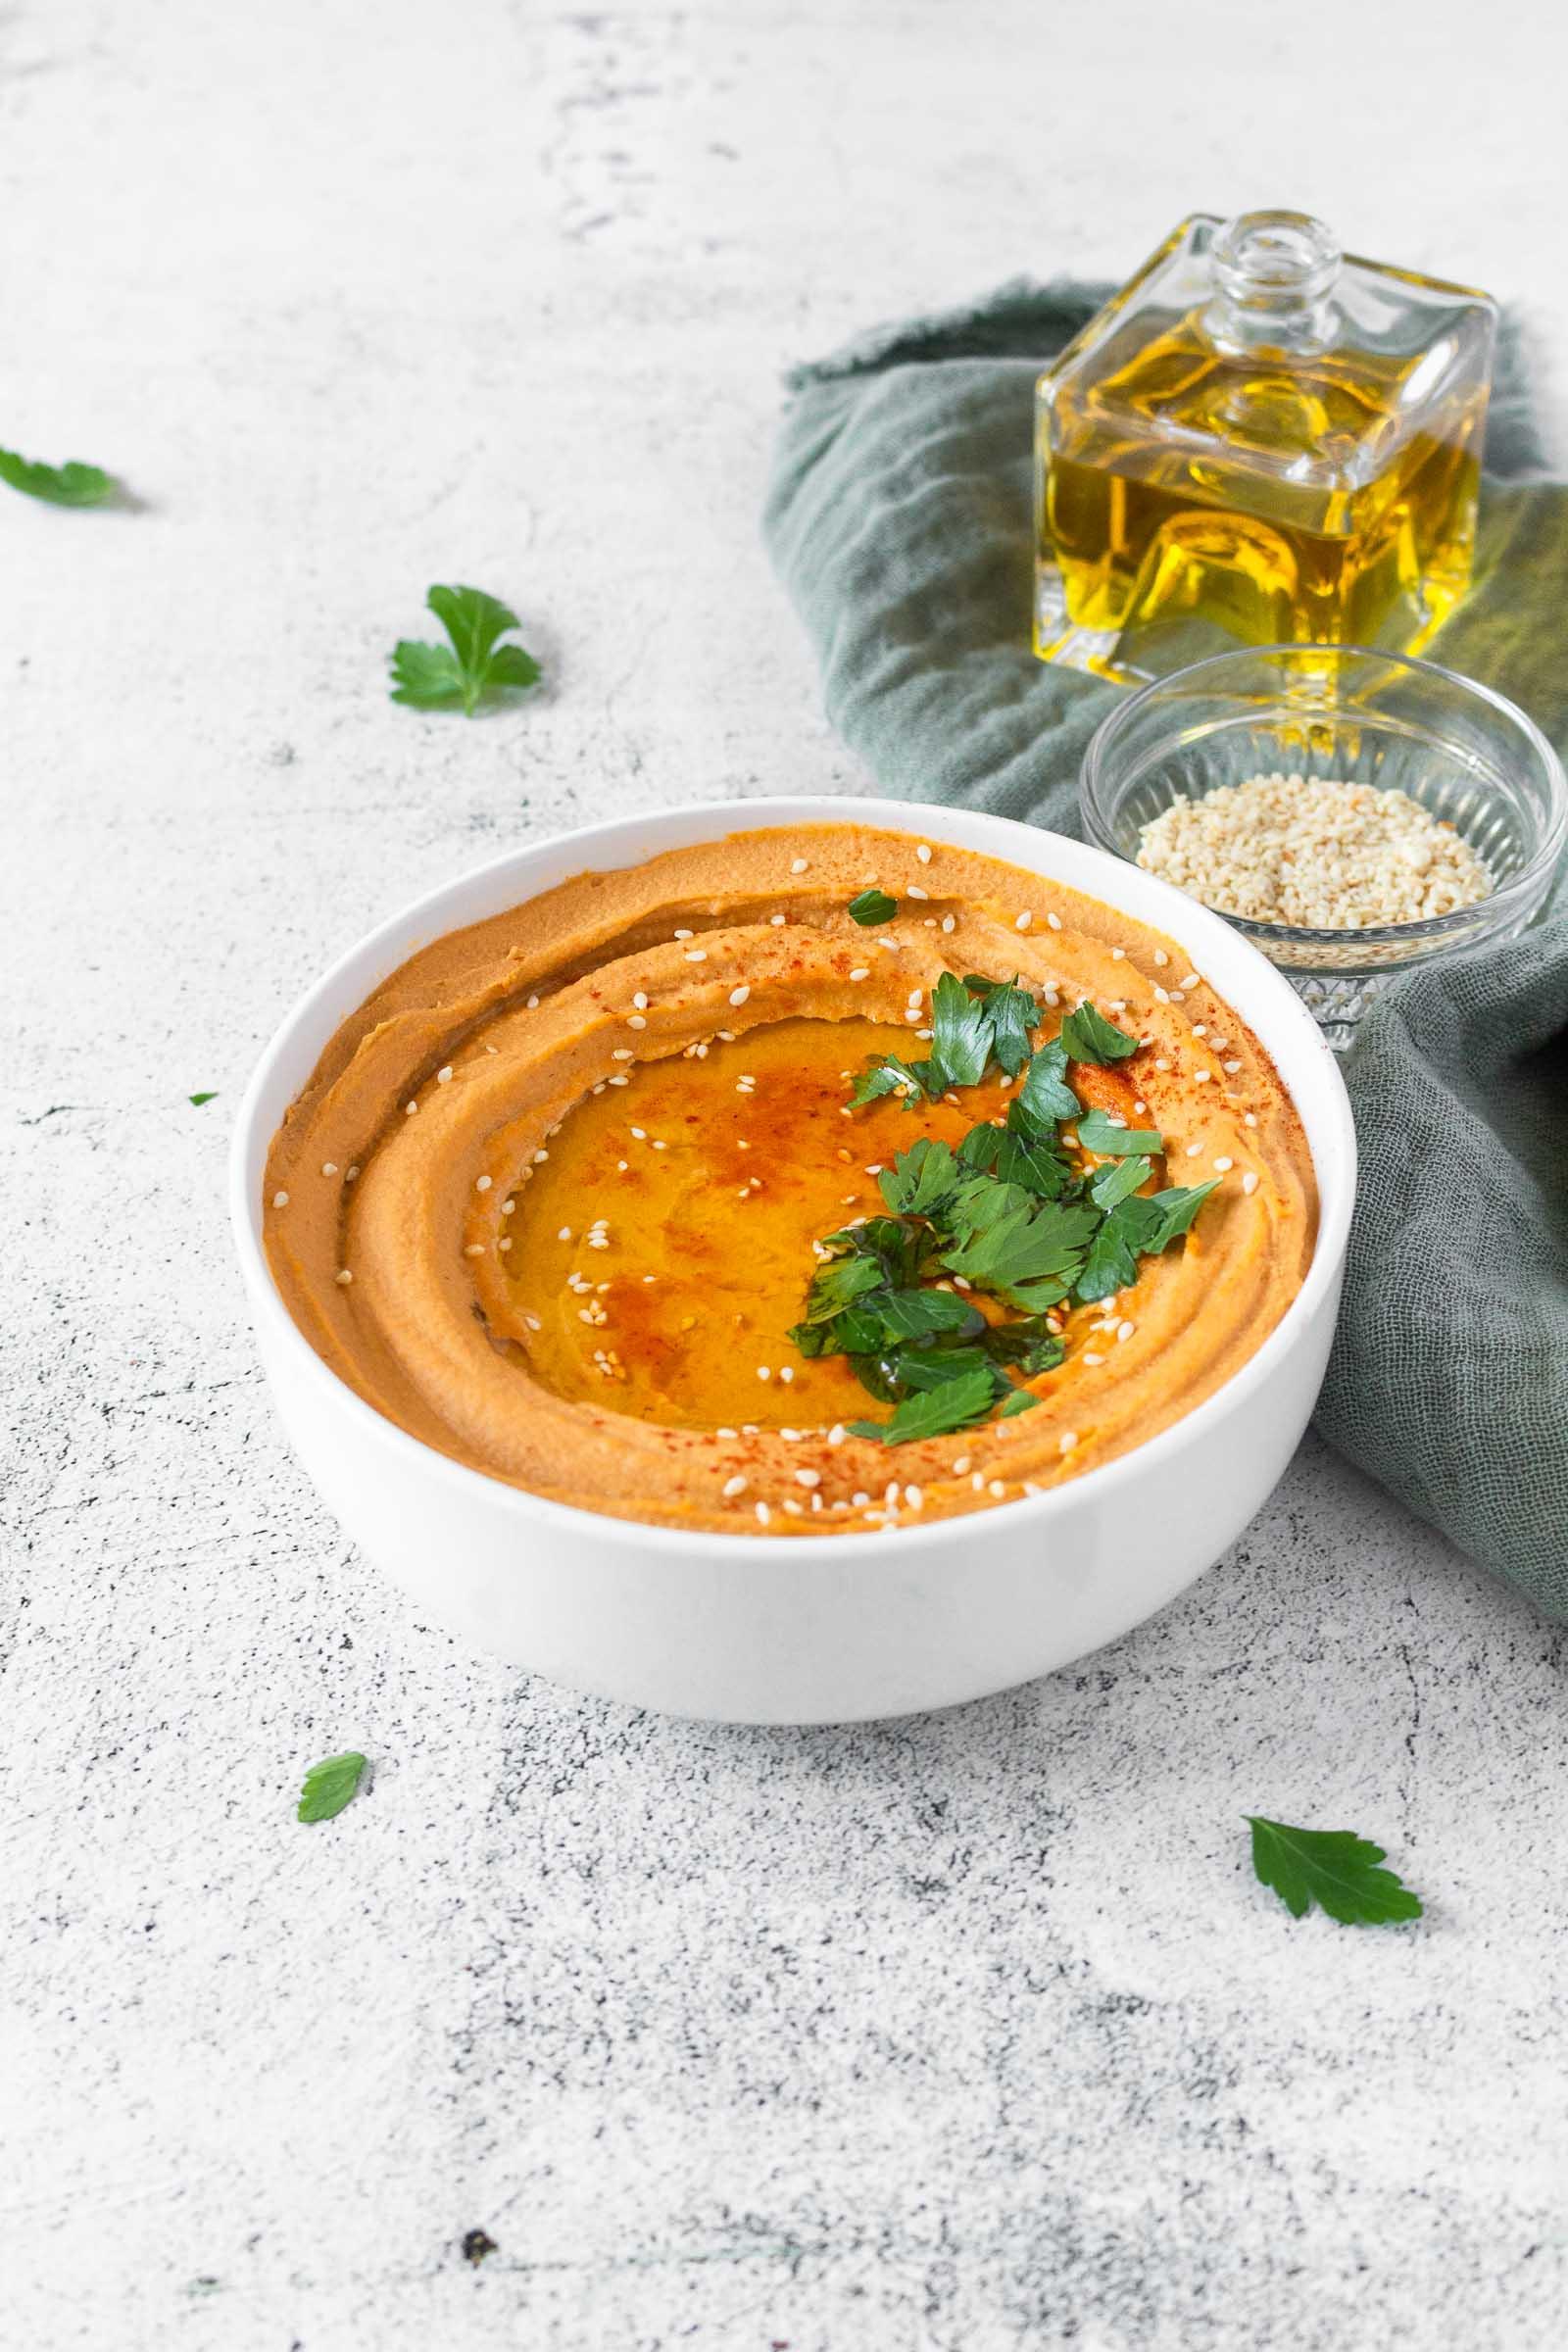 Creamy Harissa Hummus